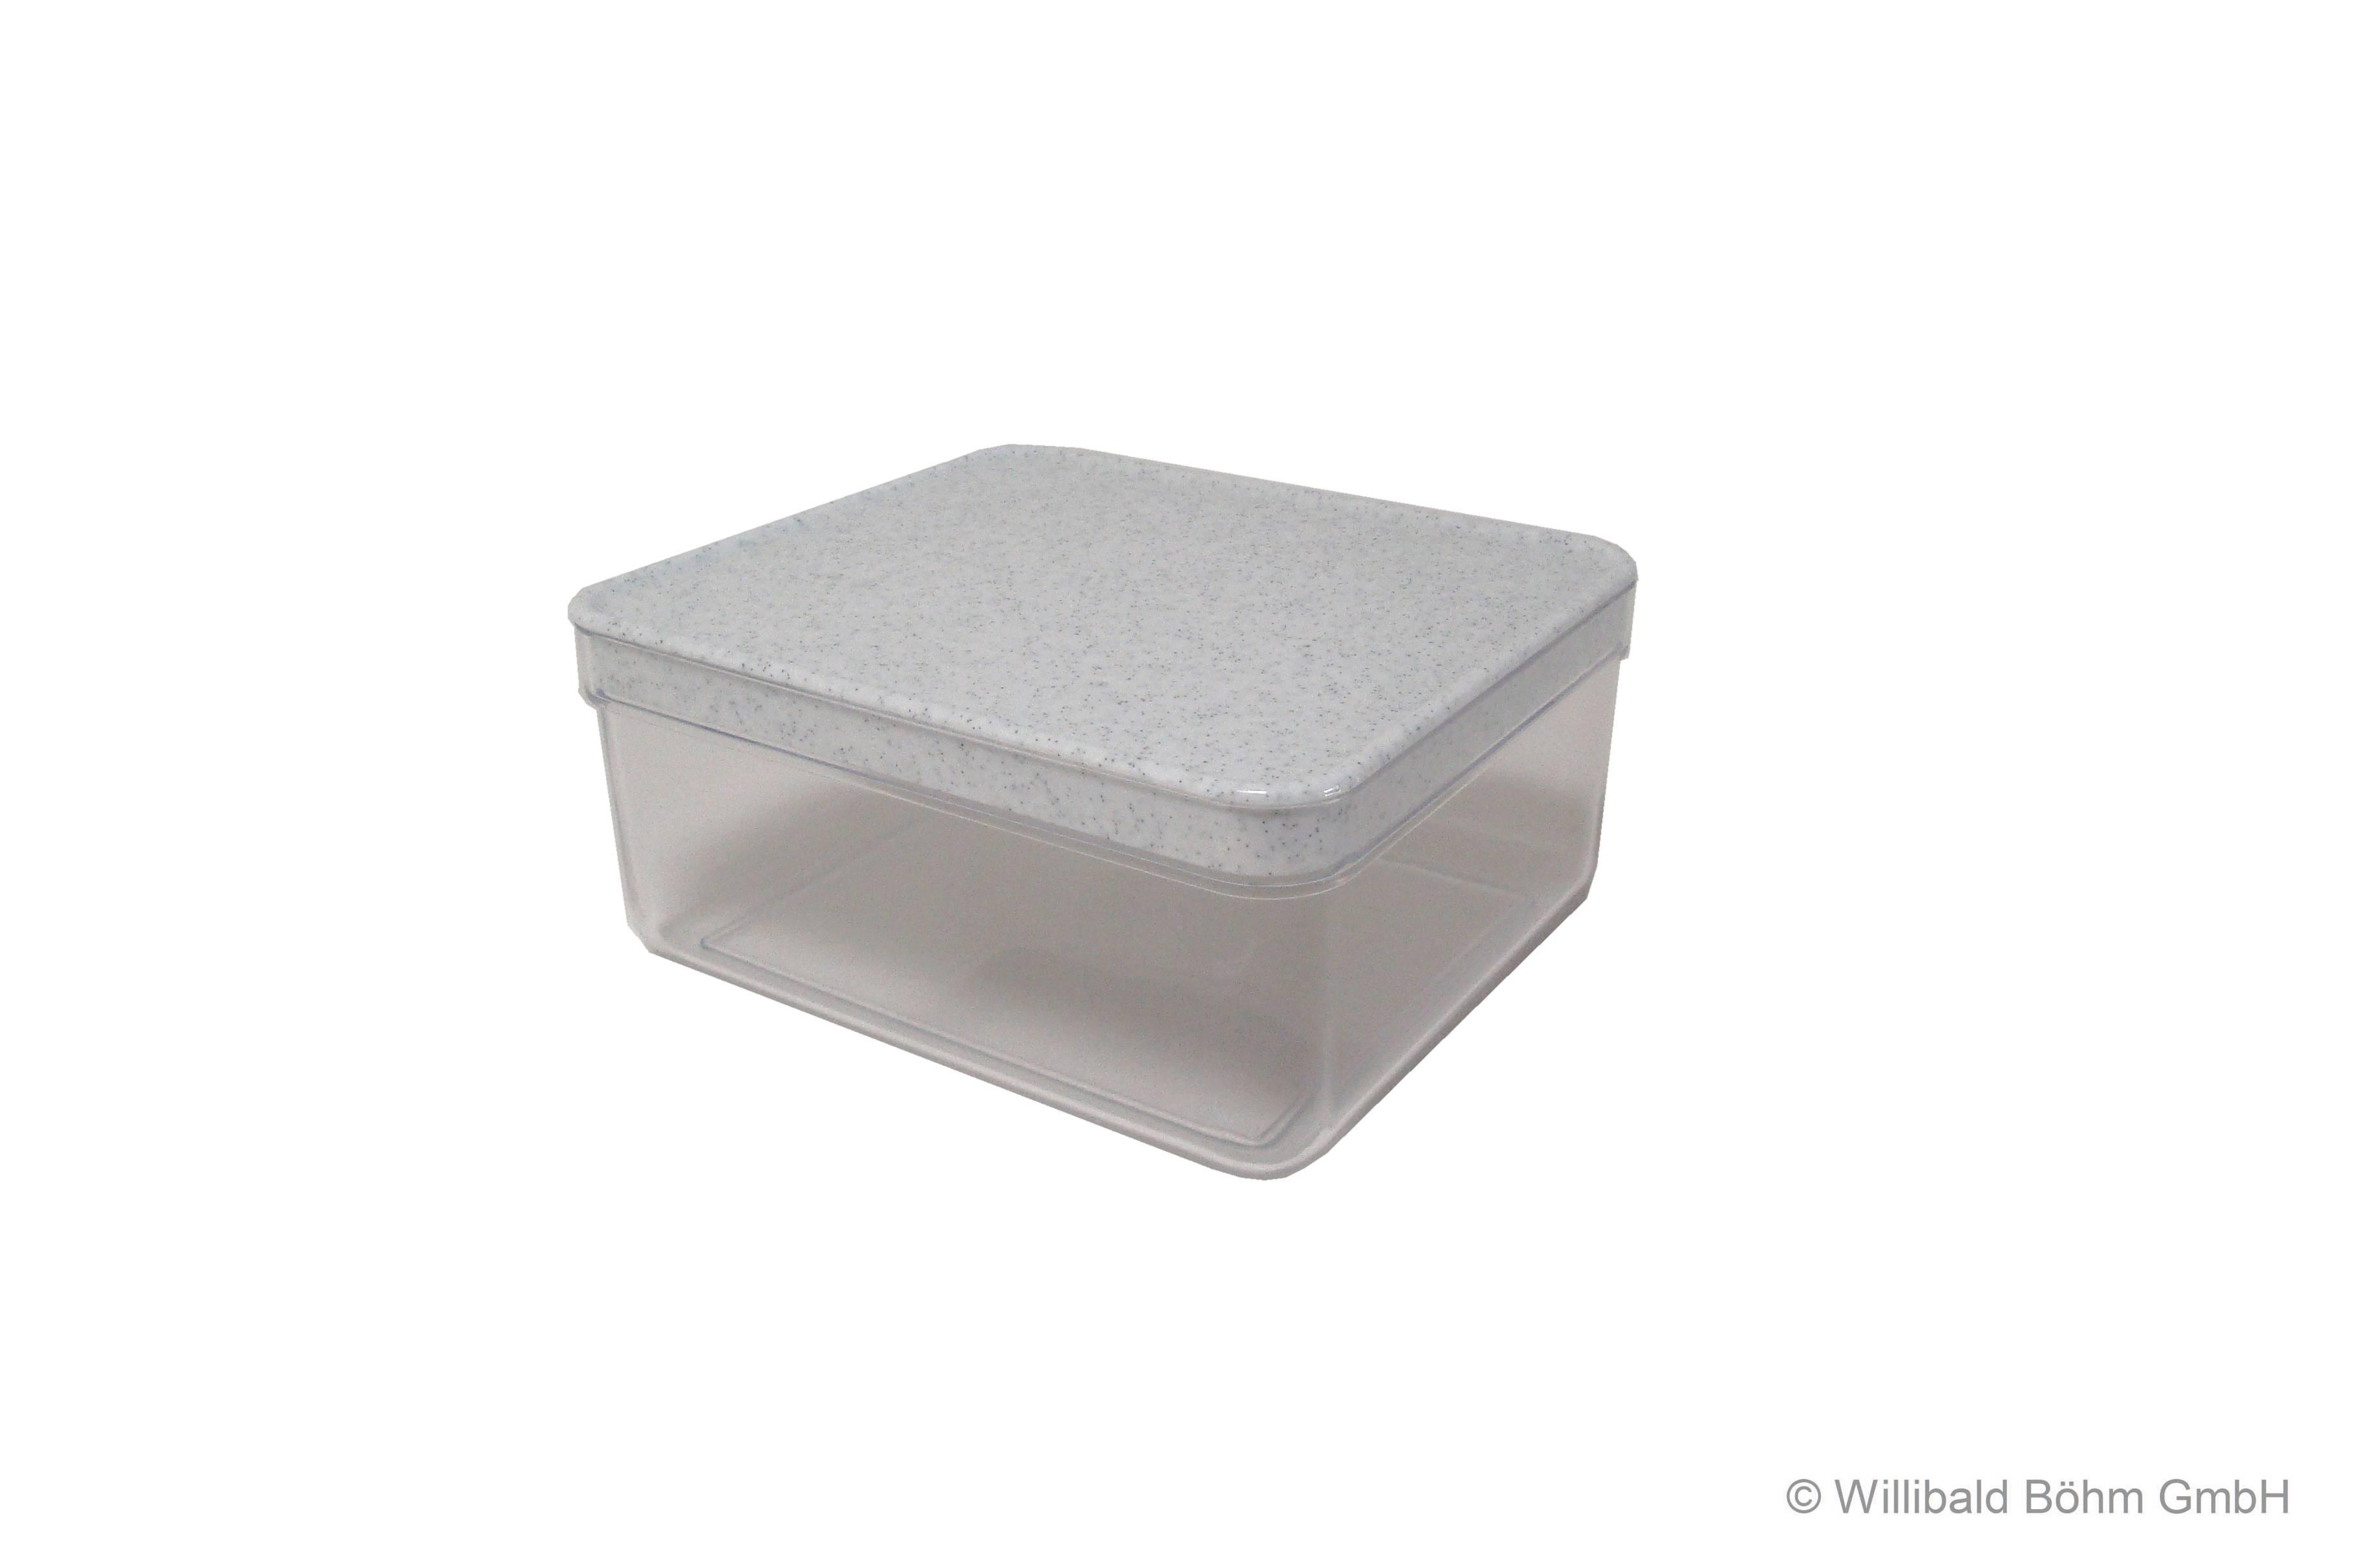 k hldose 1 2 l k hldosen vorratsdosen sonja plastic haushaltswaren reifra kunststofftechnik gmbh. Black Bedroom Furniture Sets. Home Design Ideas